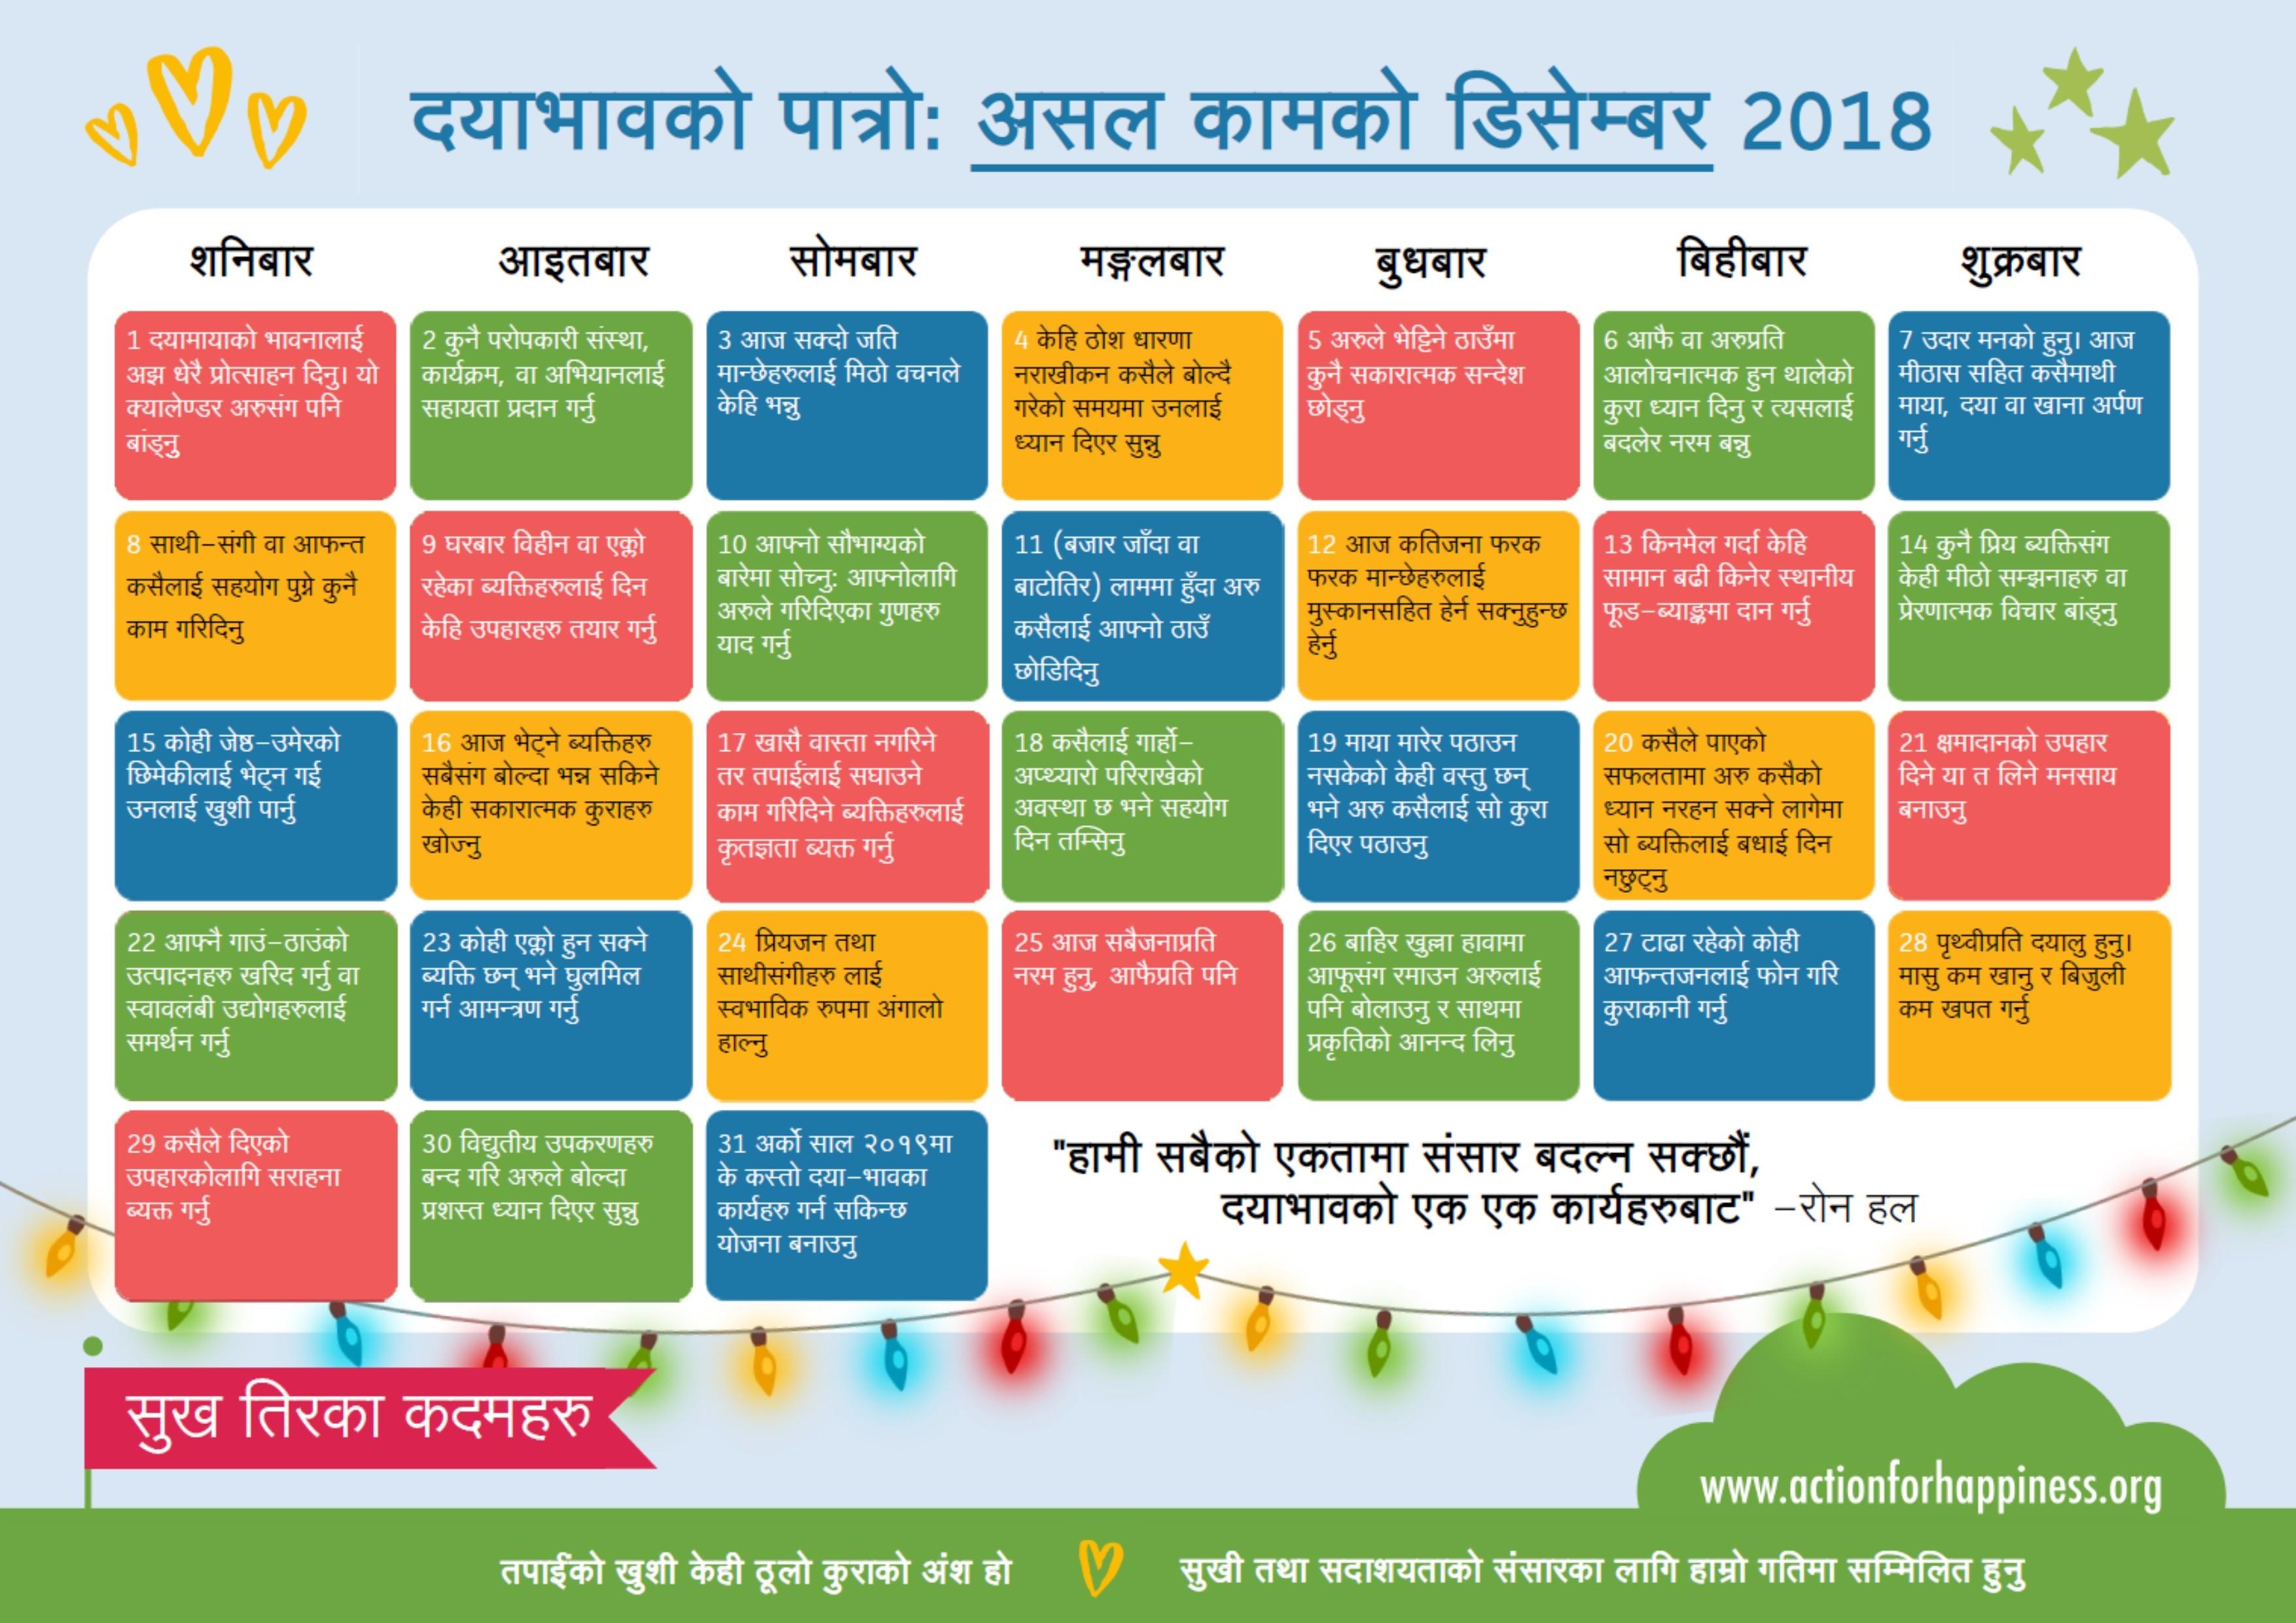 March 2019 Calendar Sri Lanka Más Caliente Action for Happiness Of March 2019 Calendar Sri Lanka Más Arriba-a-fecha events City Nomads